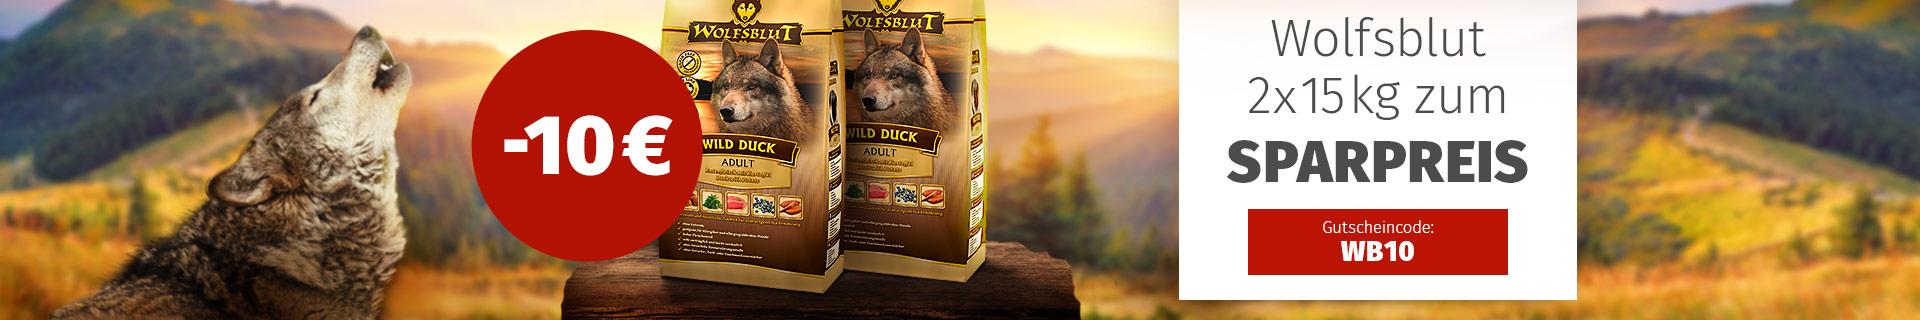 Wolfsblut Trockenfutter Vorratsaktion - 10€ Rabatt